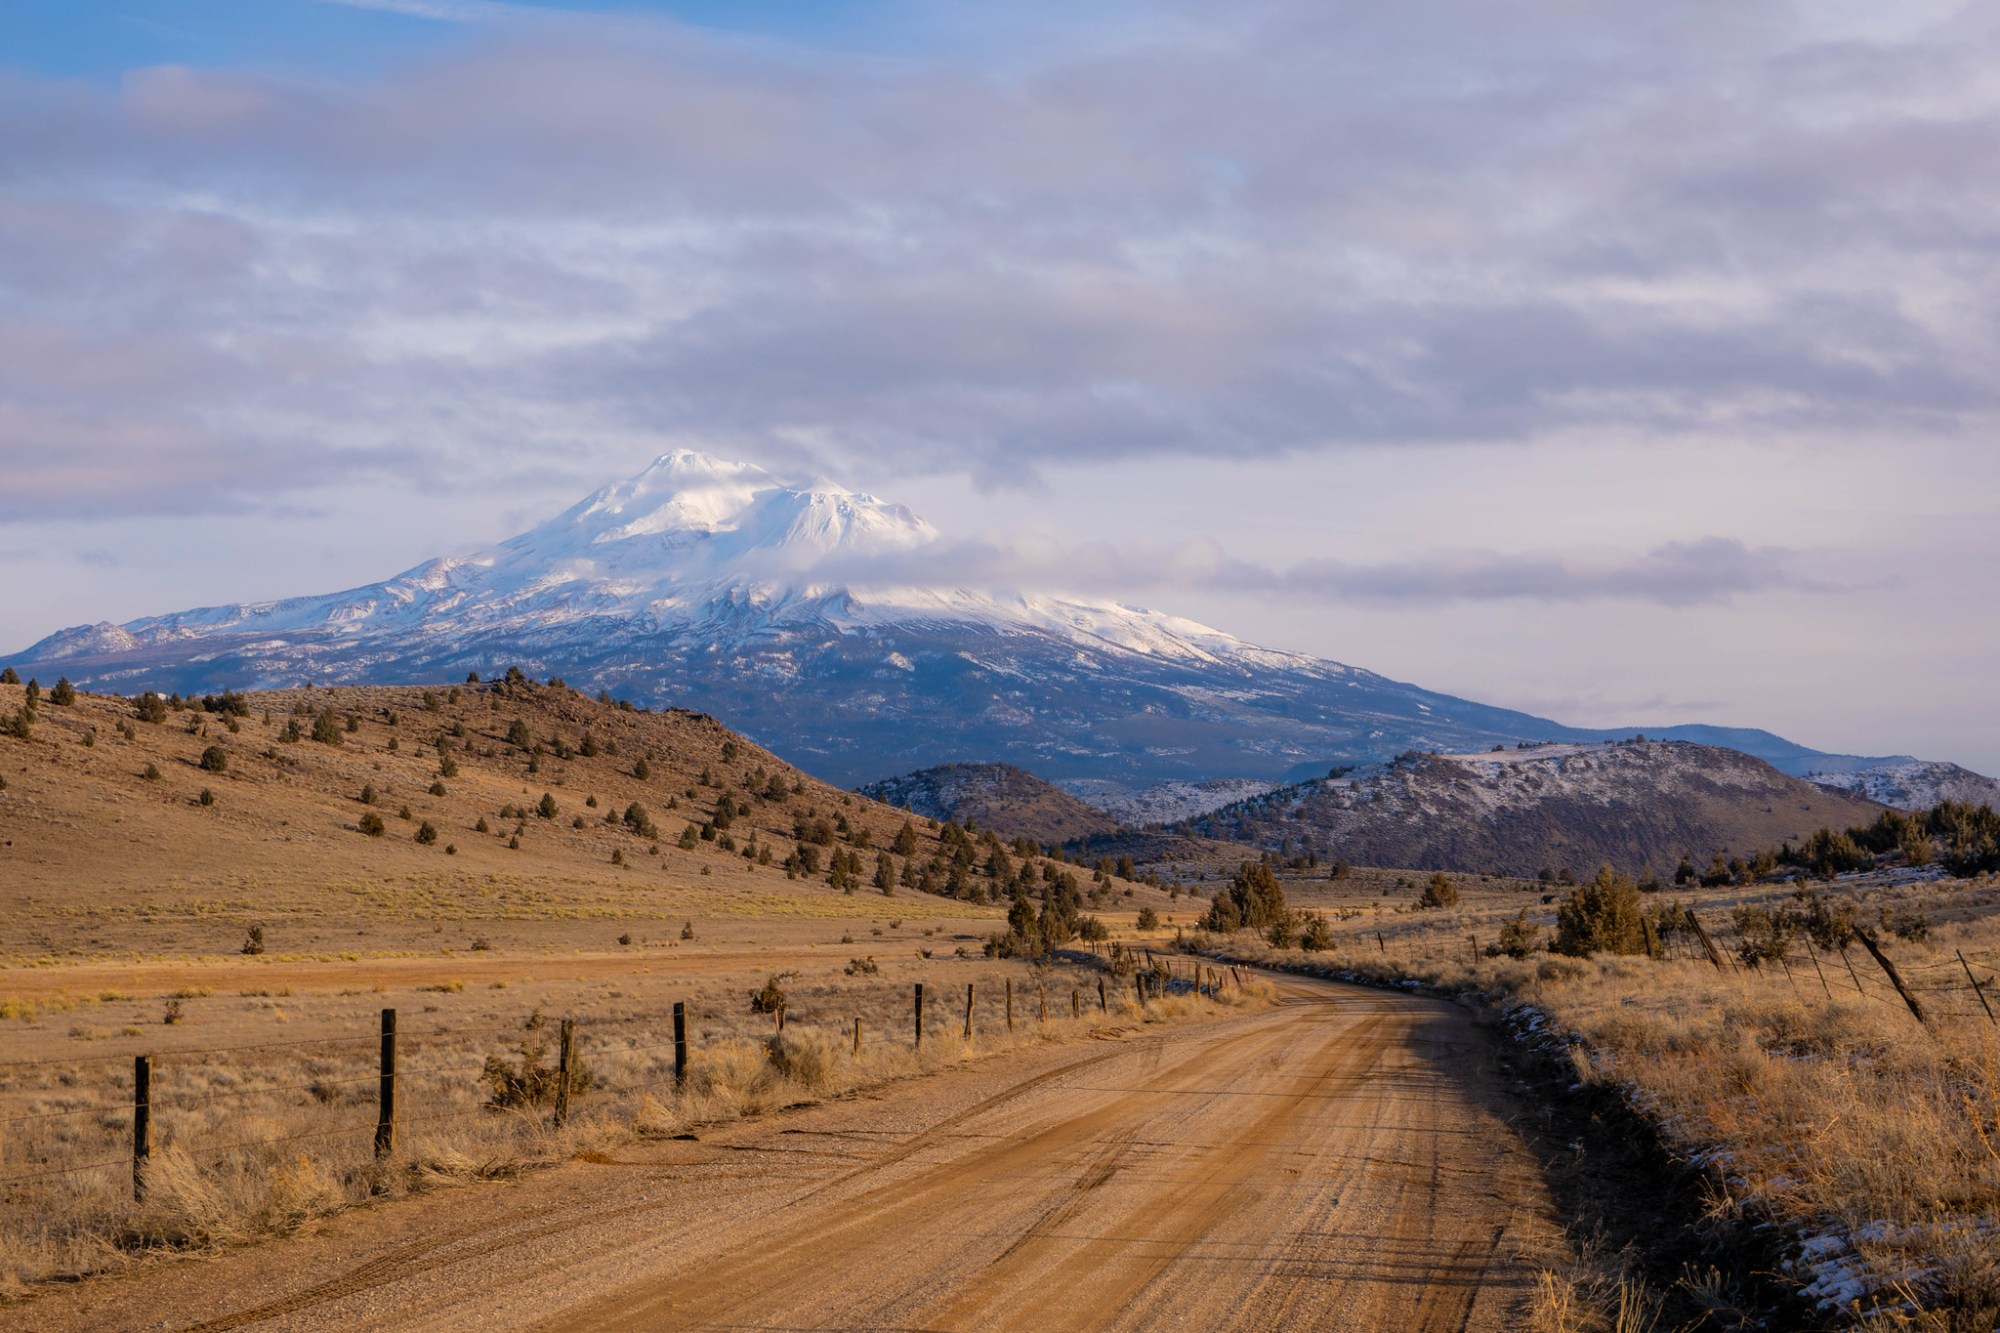 01.18. Mt Shasta